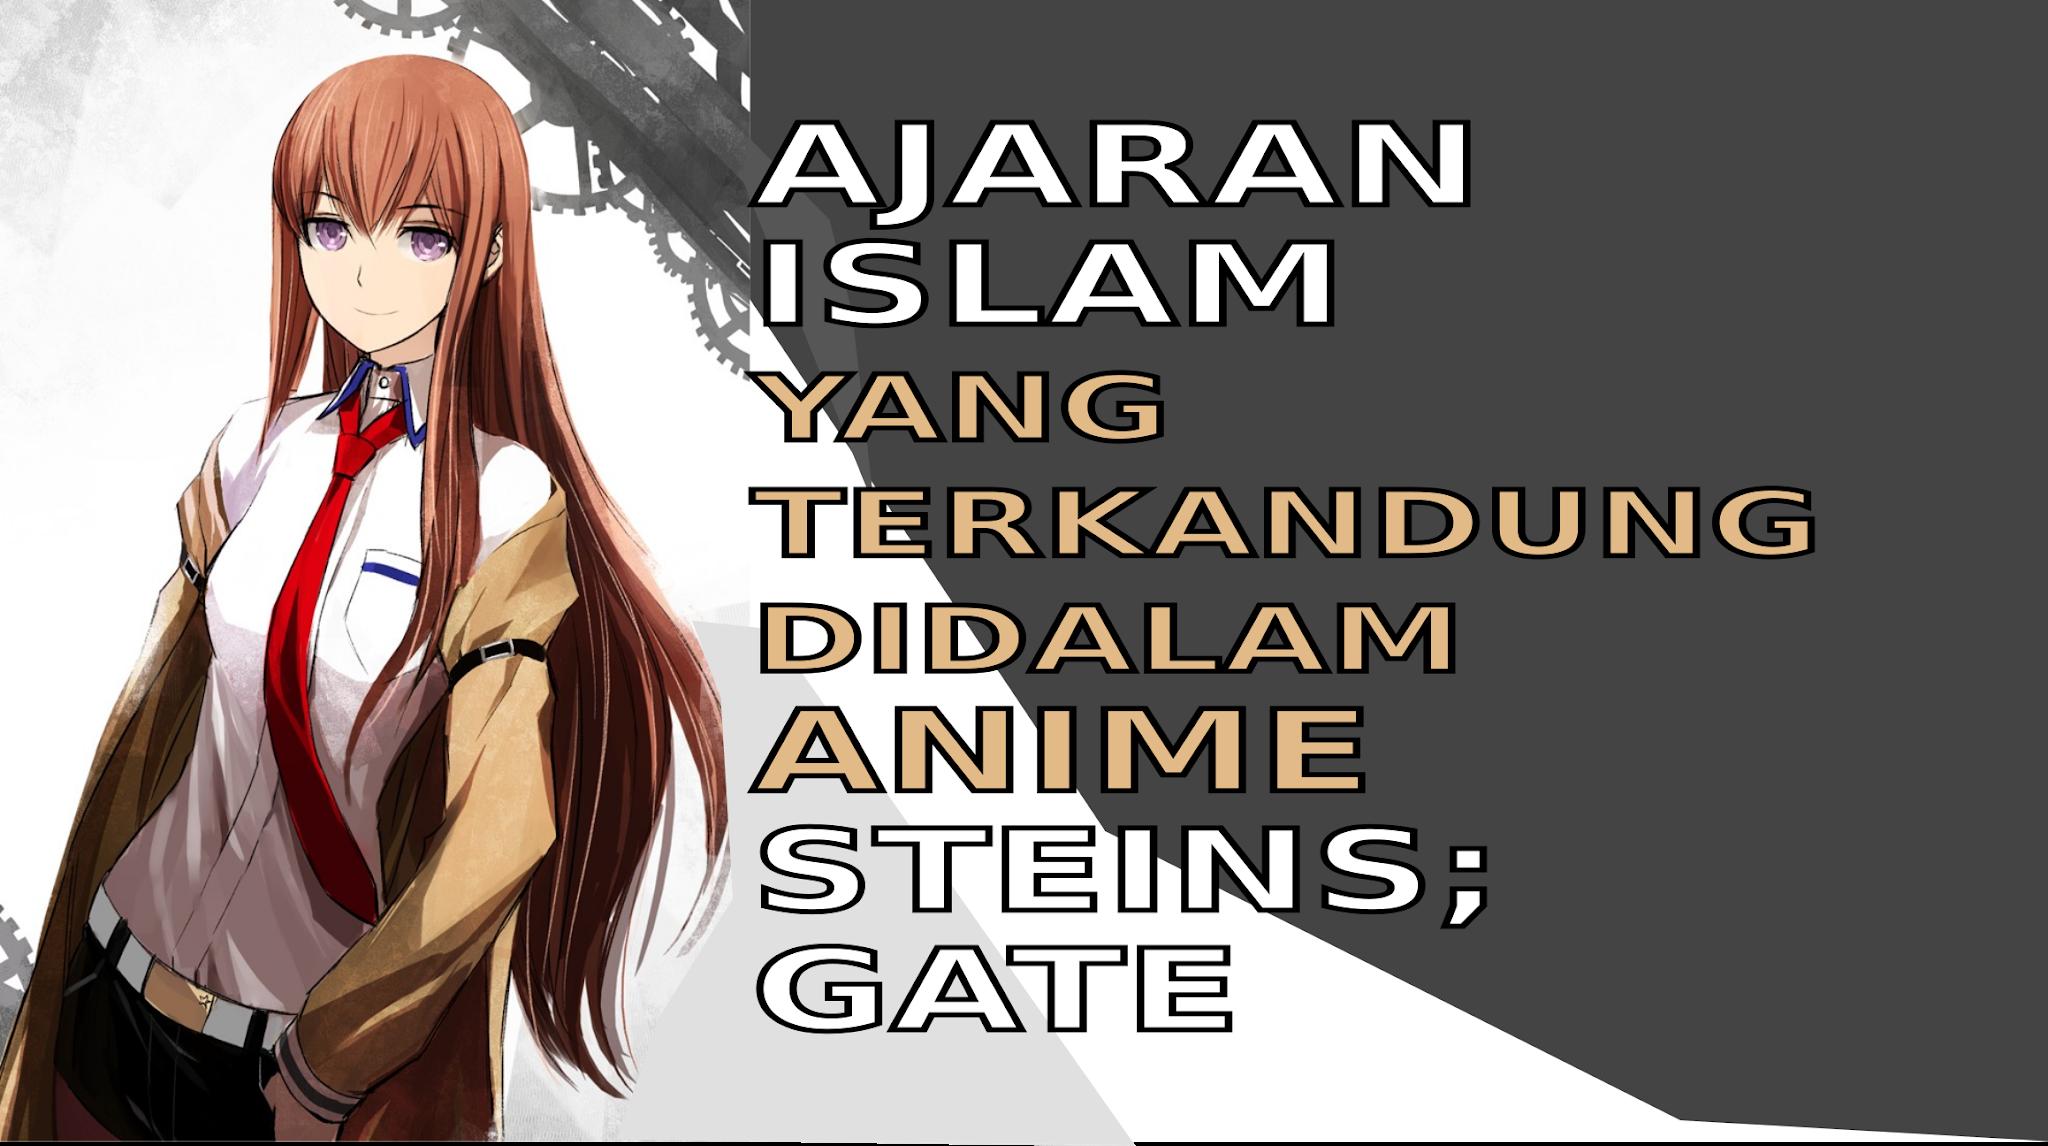 Ajaran Islam di dalam anime Steins;Gate